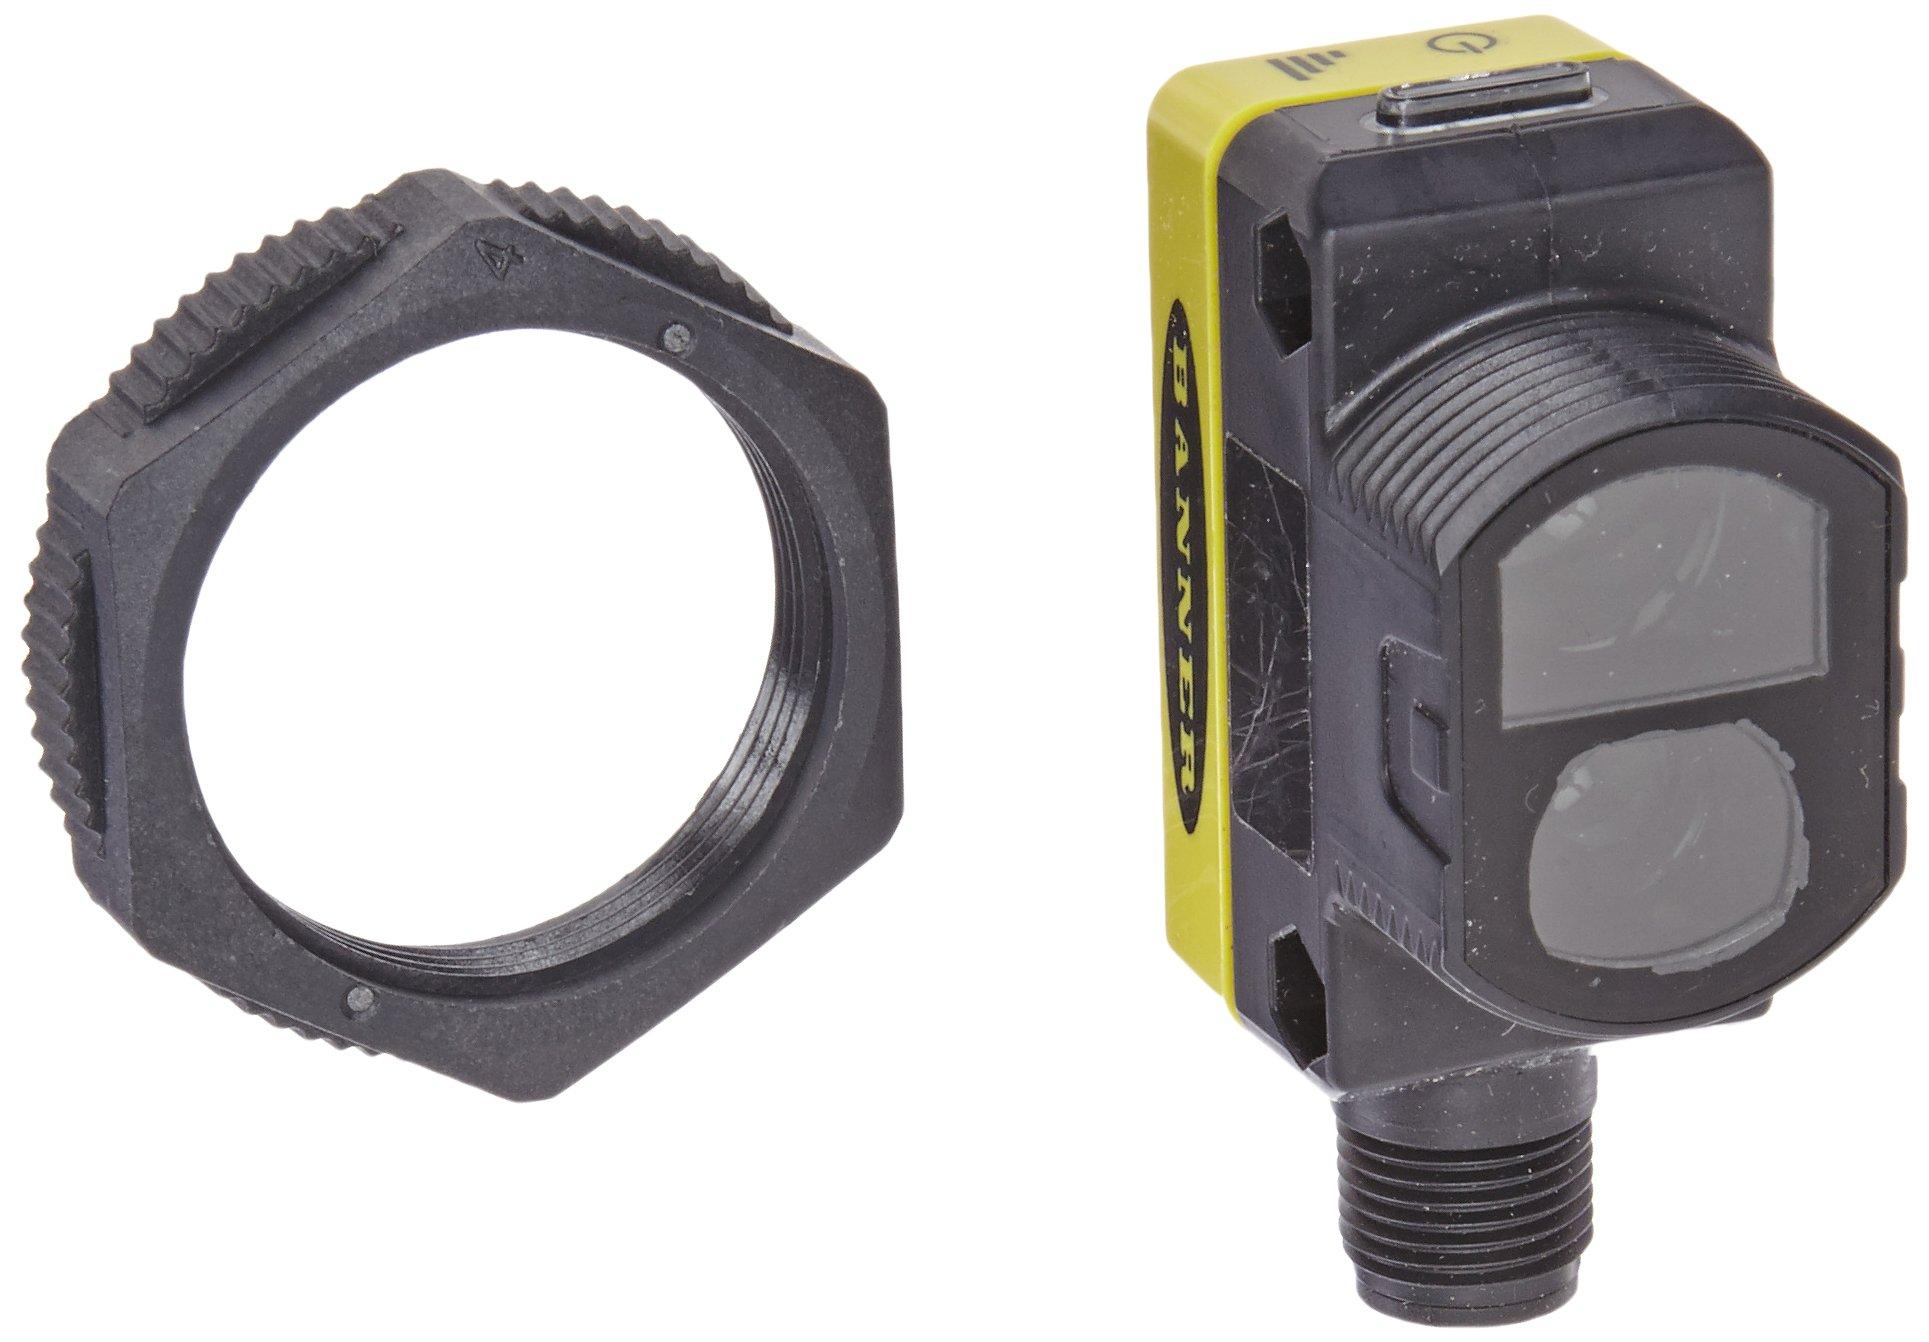 Banner QS30LPQ World Beam Universal Sensor, Polarized Retroreflective Sensing Mode, 5-pin Integral Euro-Style QD Connection, Visible Red LED, 10-30 VDC Supply Voltage, Bipolar (PNP and NPN) Output, 8 m Sensing Range